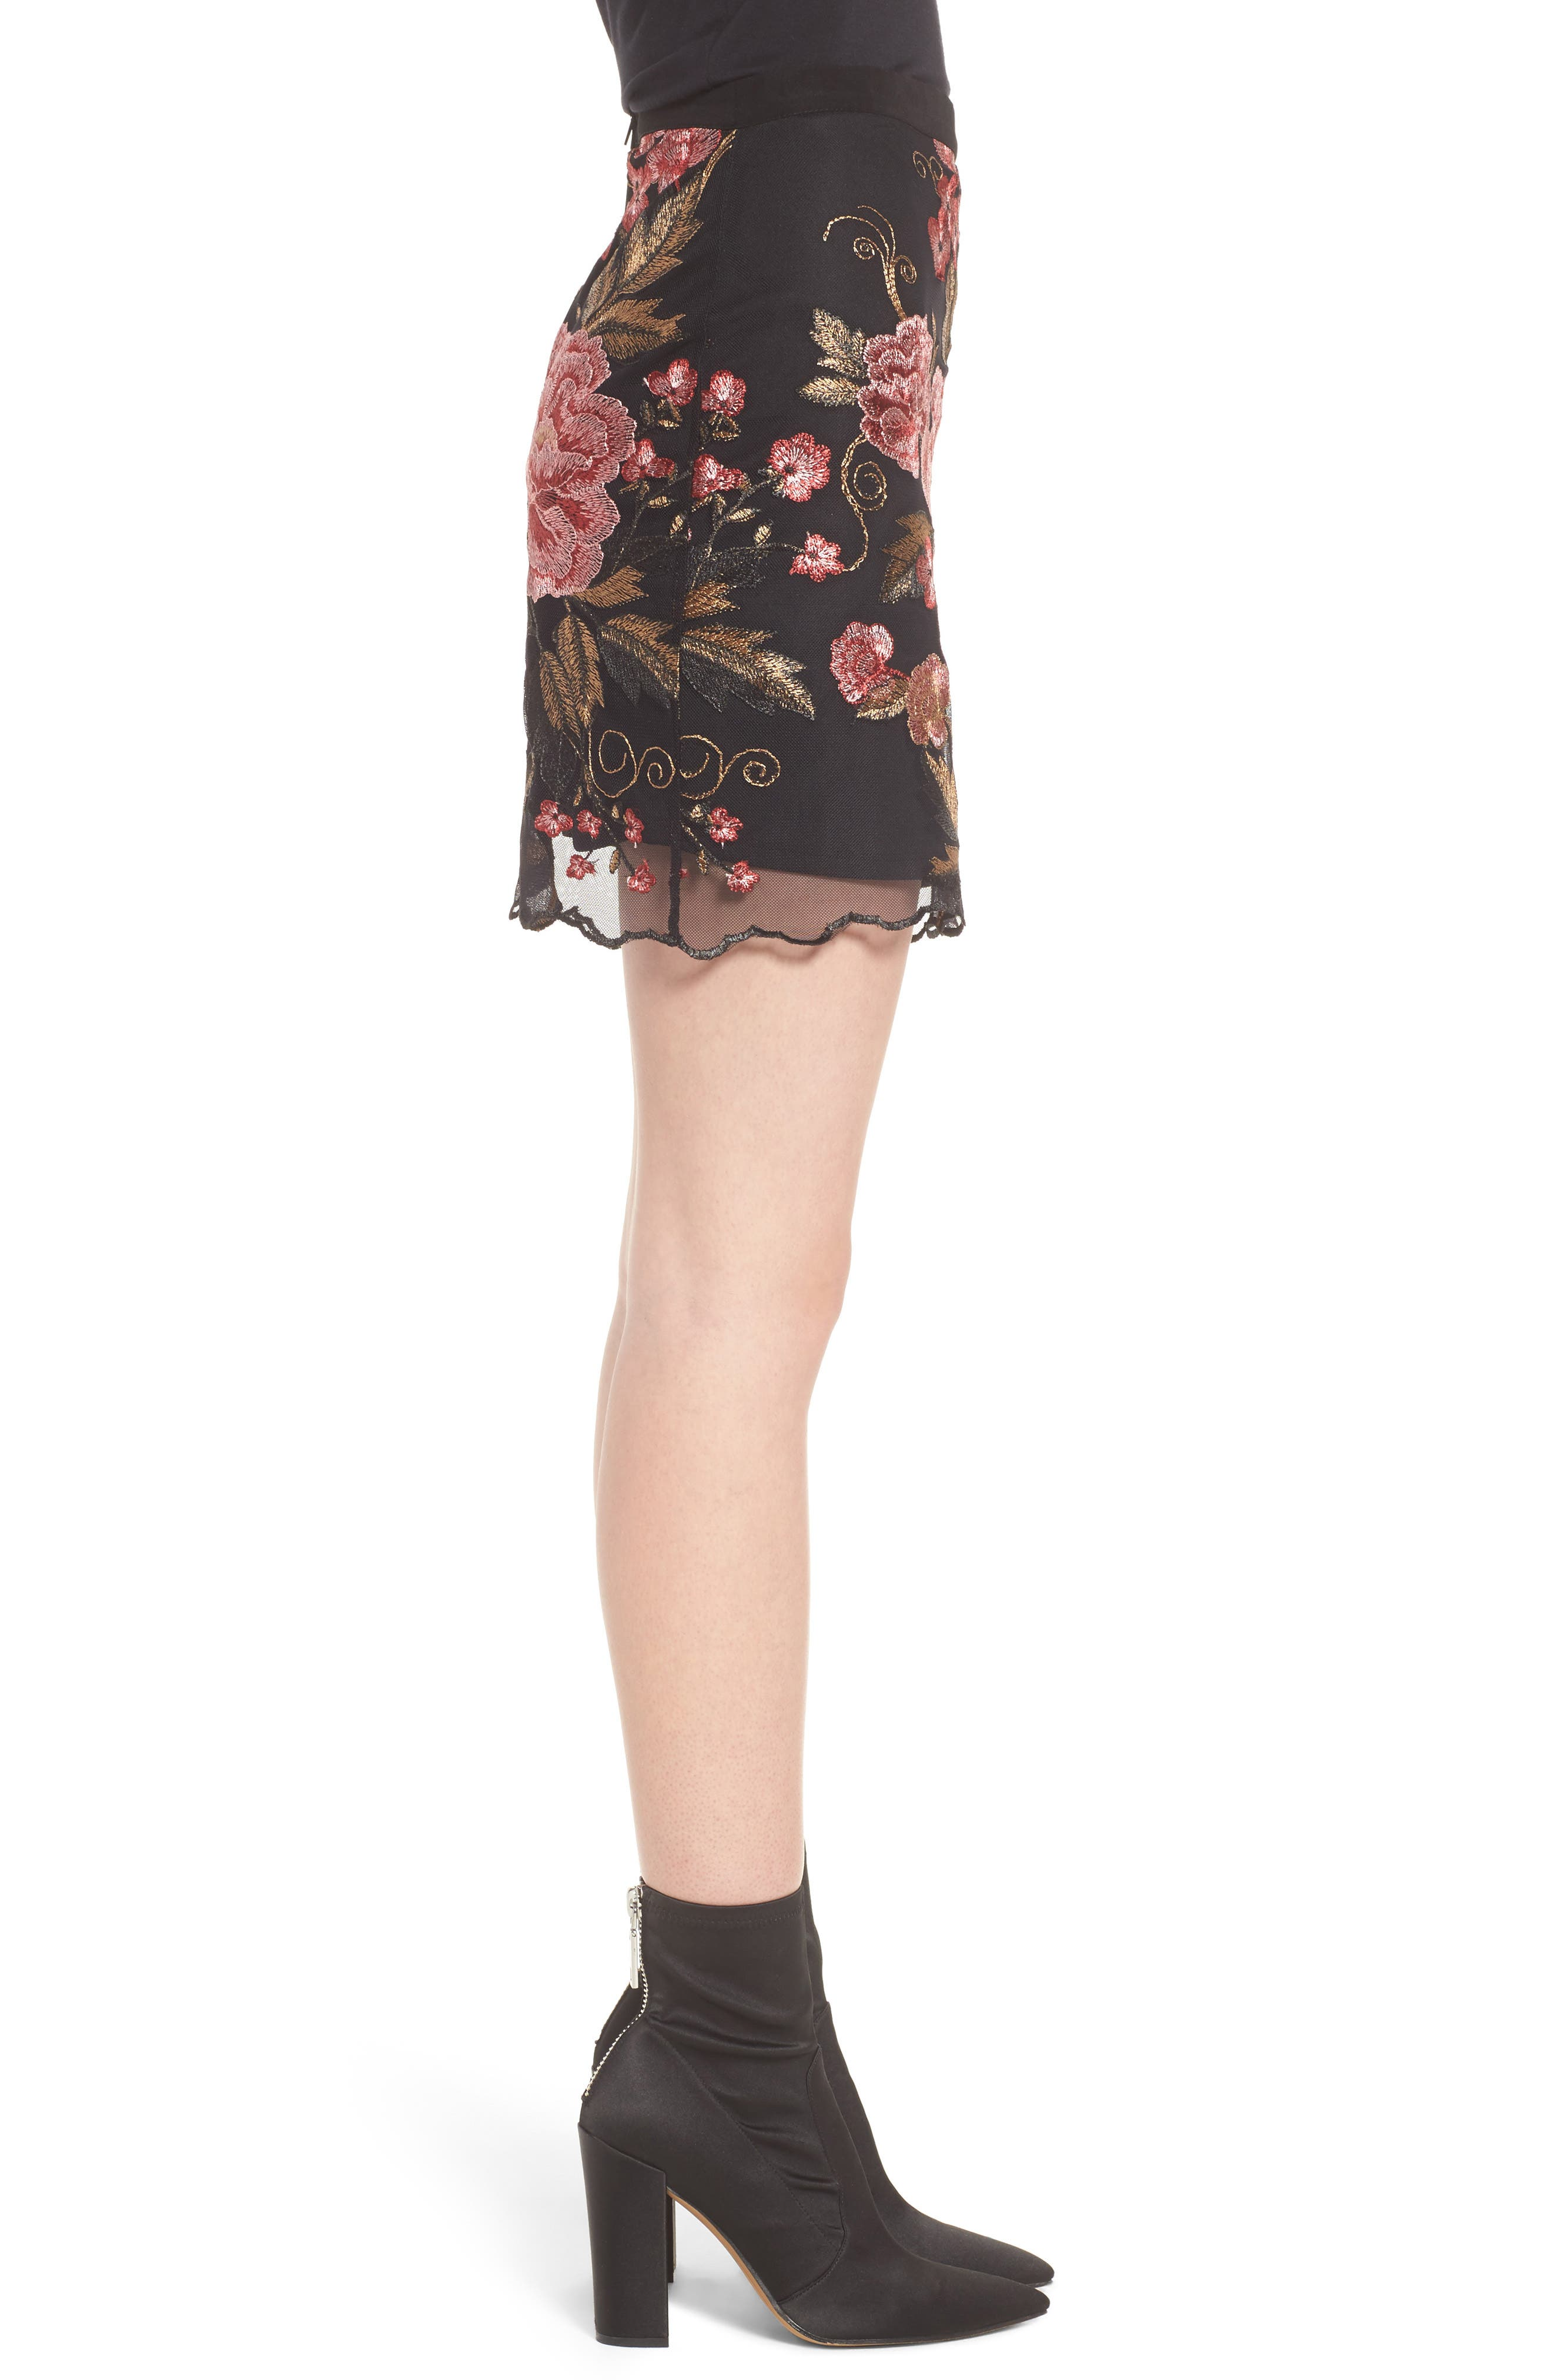 Sunset Embroidered Skirt,                             Alternate thumbnail 3, color,                             008